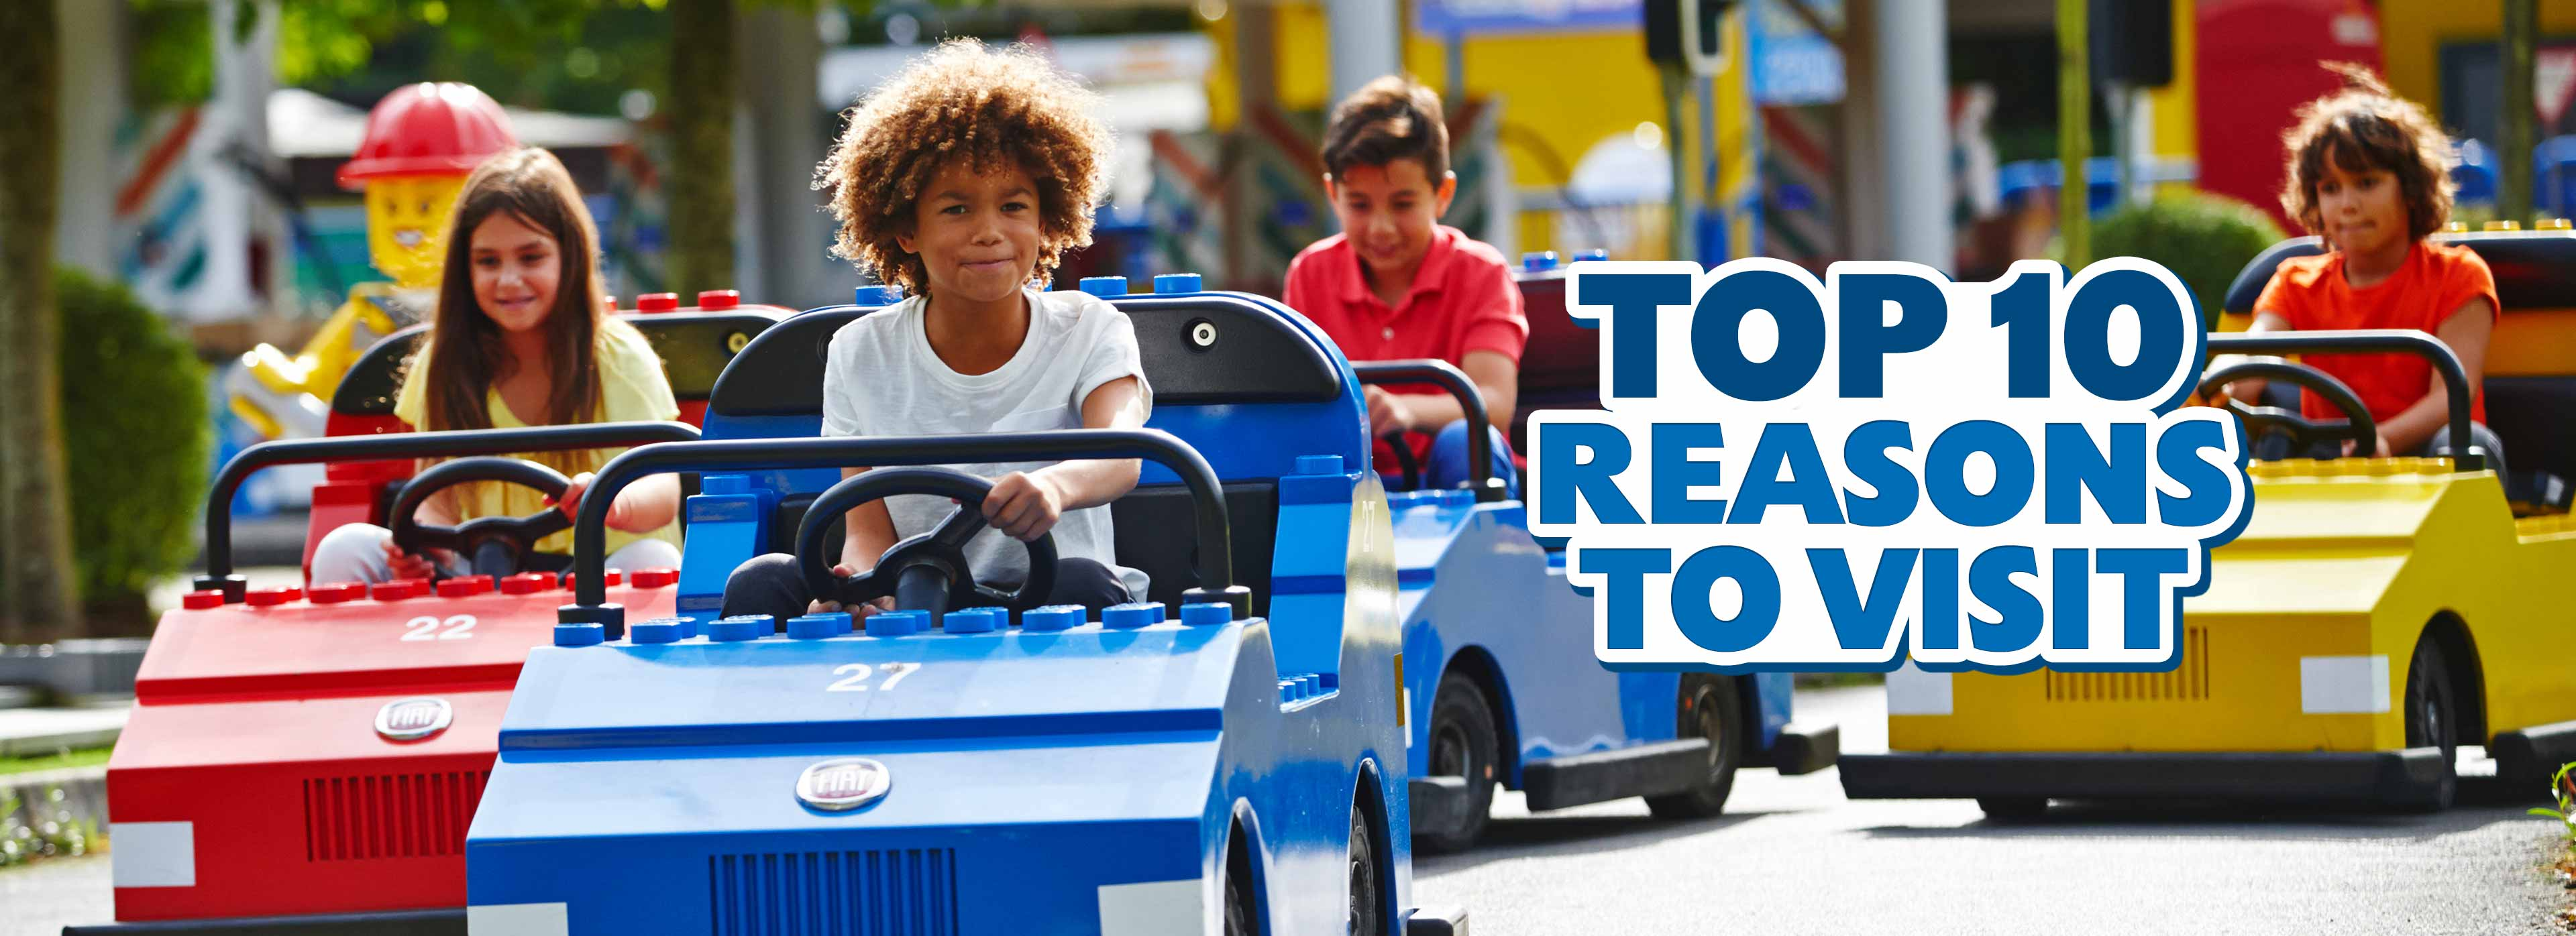 Top 10 reasons to visit legoland windsor resort 2019